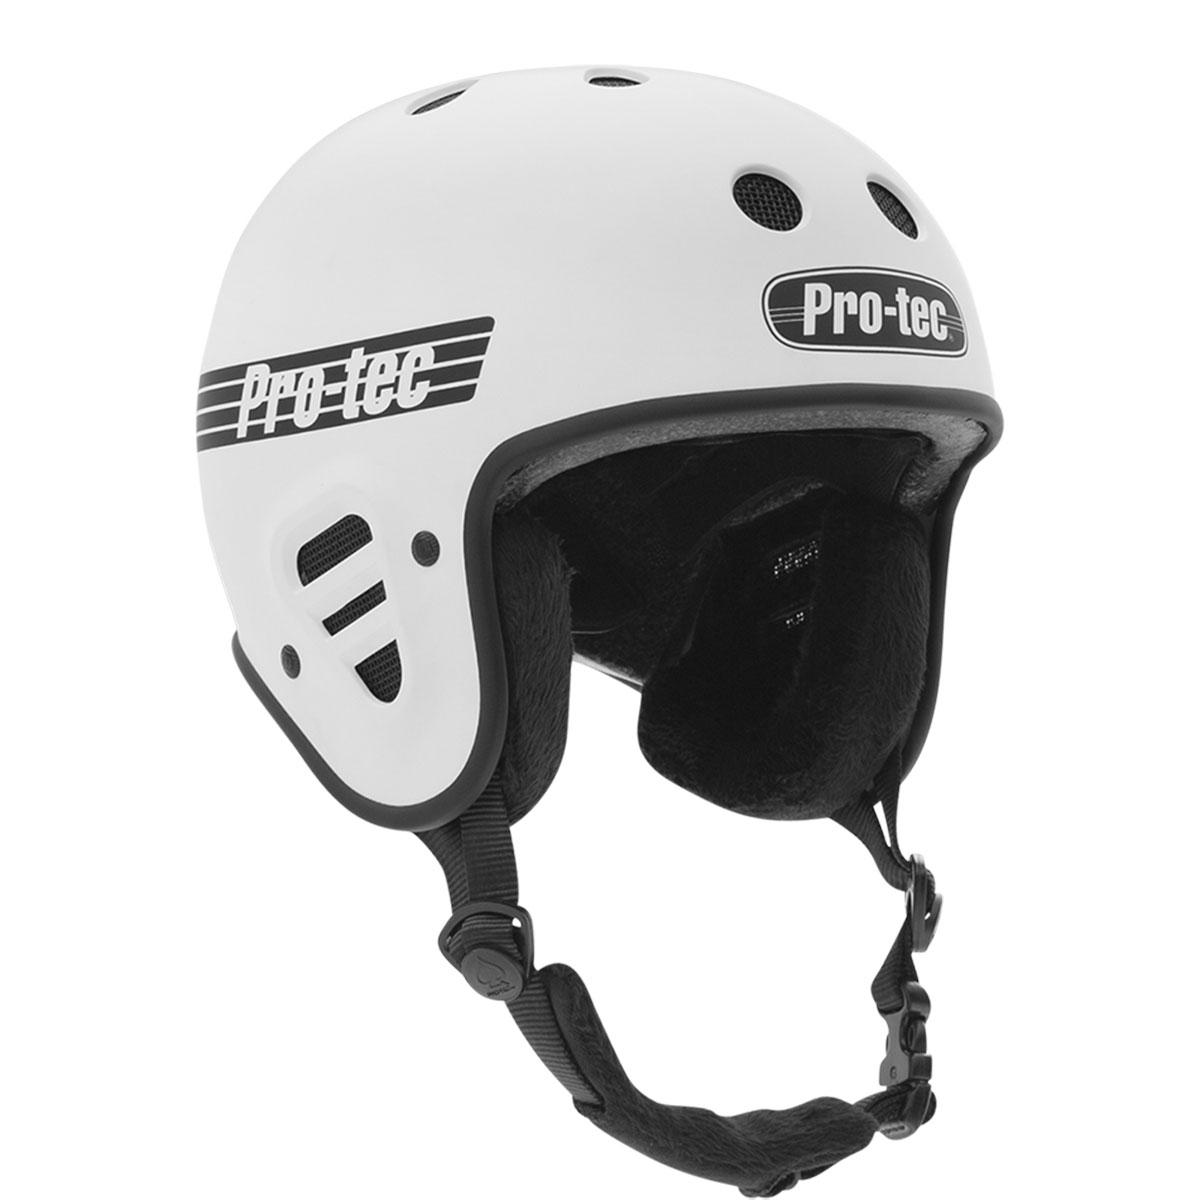 Pro-Tec Full Cut Certified Skate Helmet